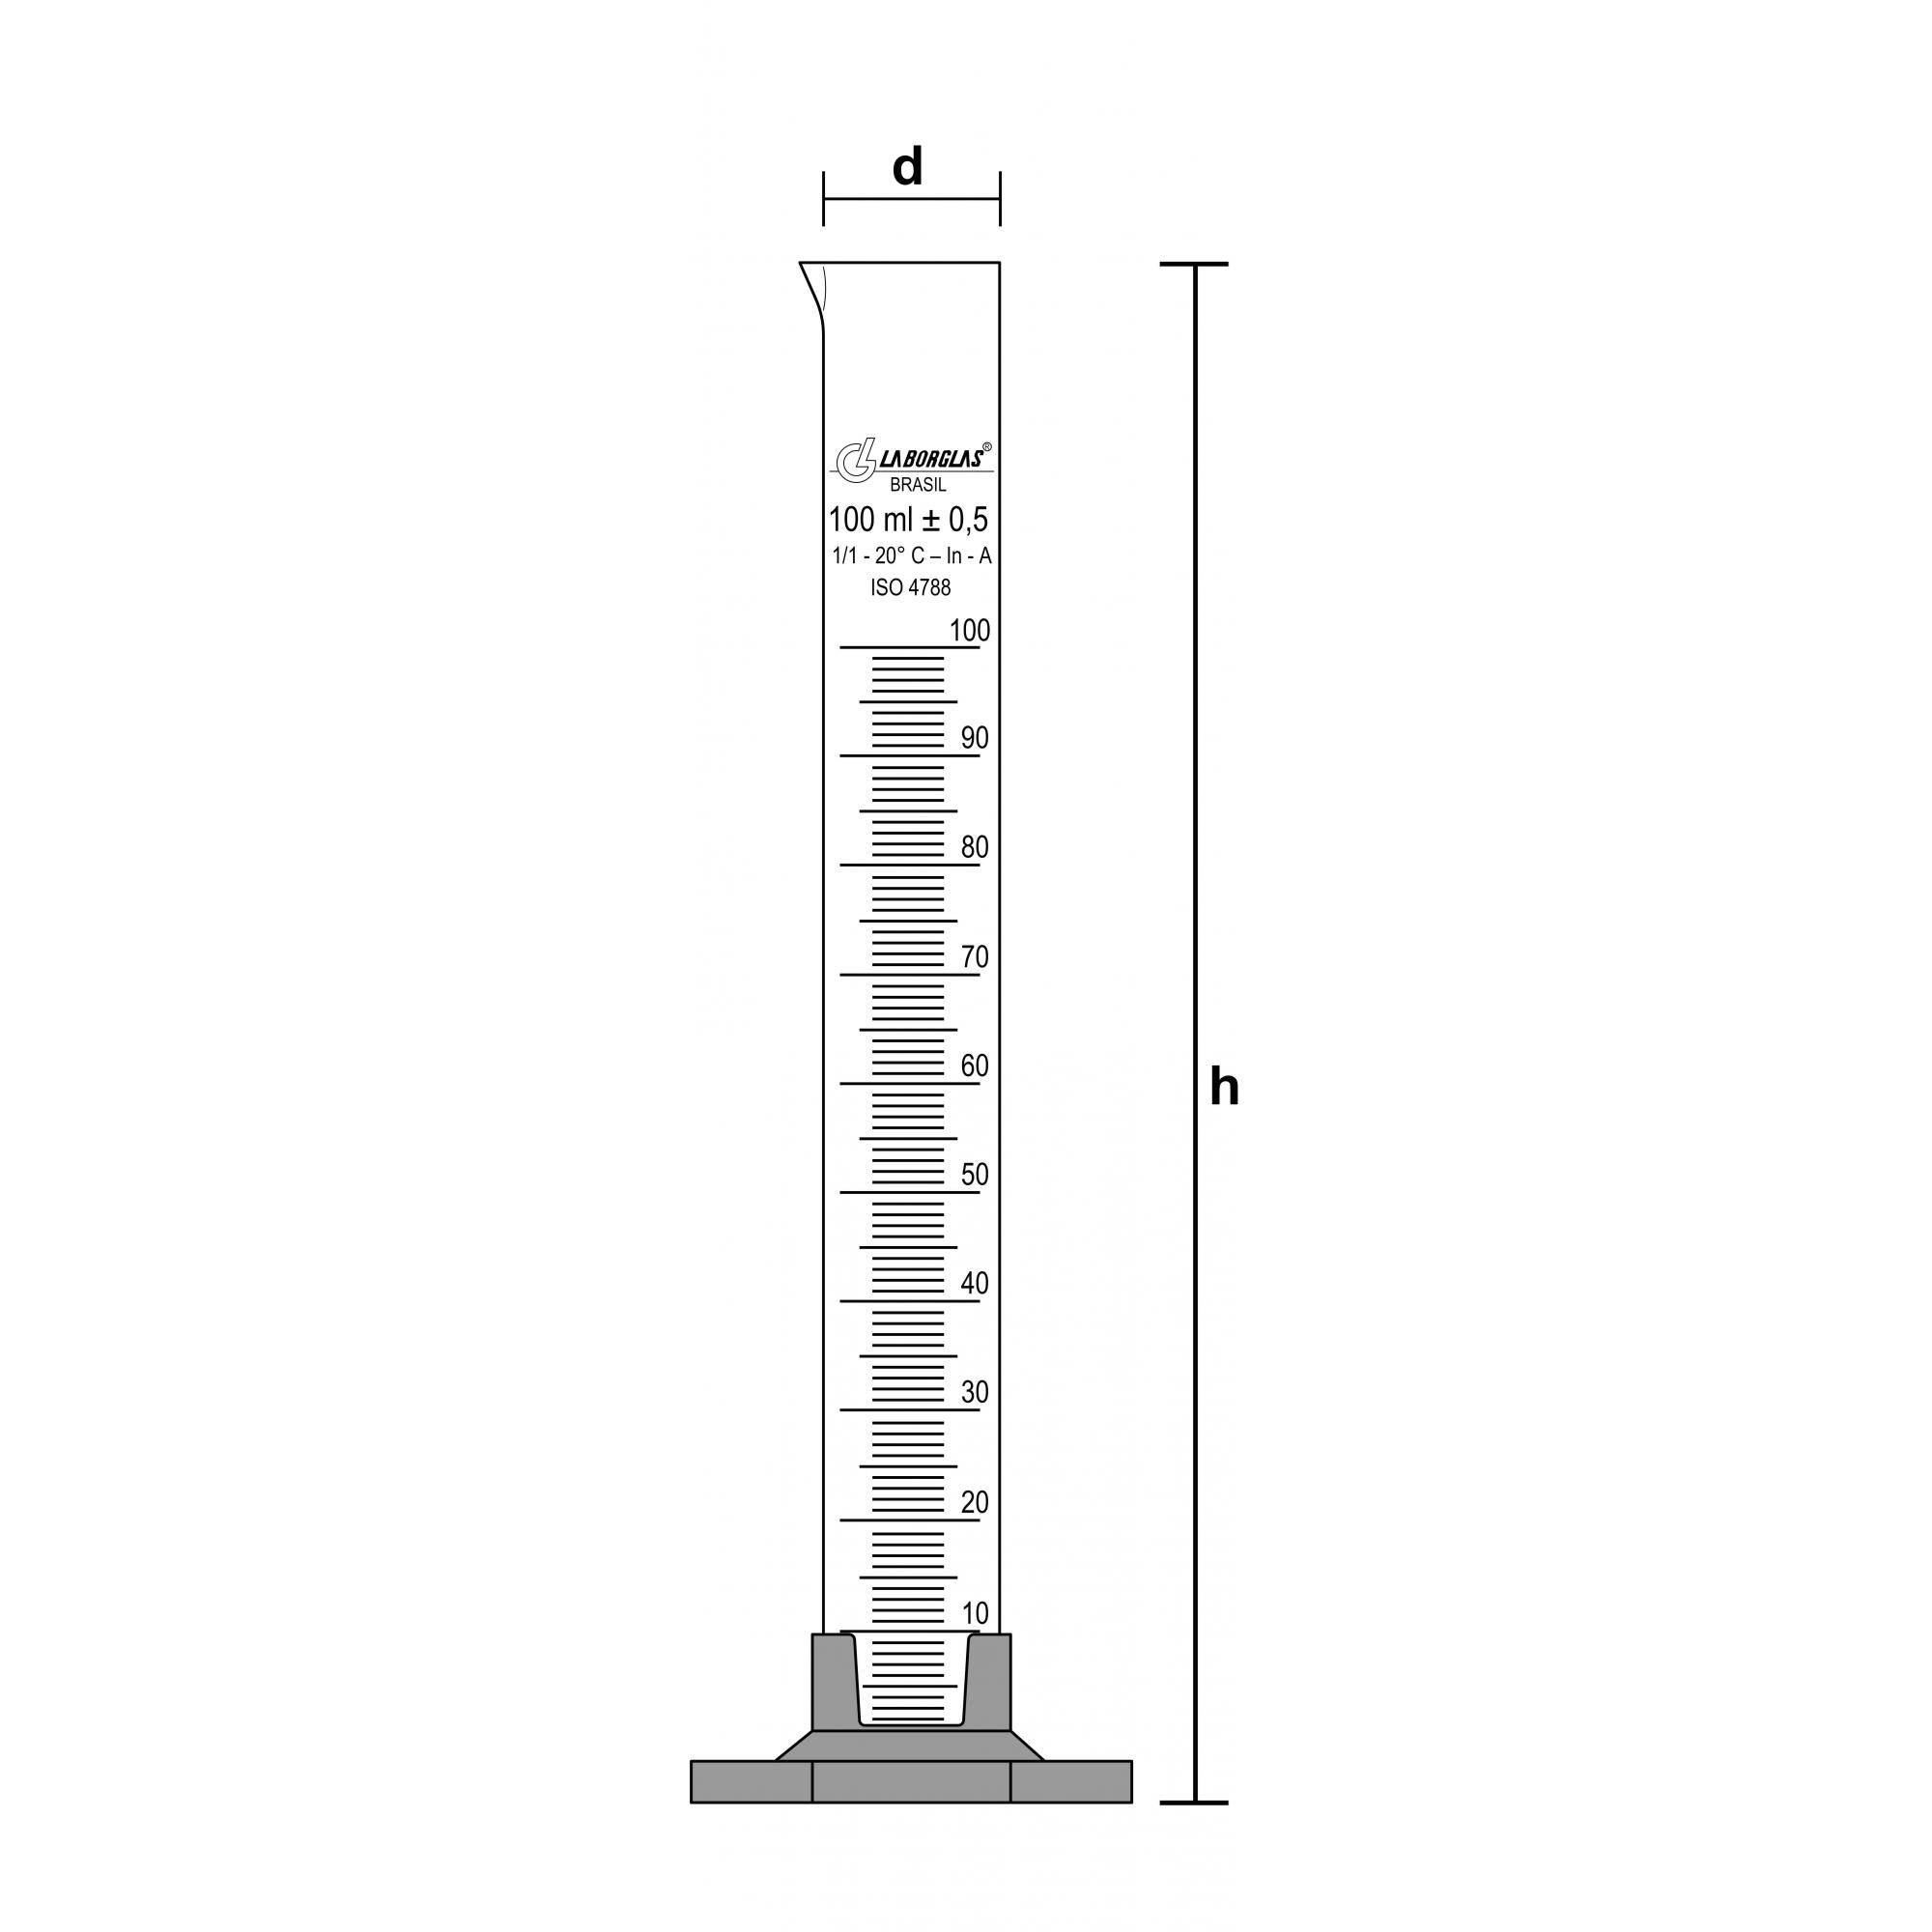 PROVETA GRADUADA BASE HEXAGONAL DE POLIPROPILENO CLASSE A 50 ML - Laborglas - Cód. 9138717